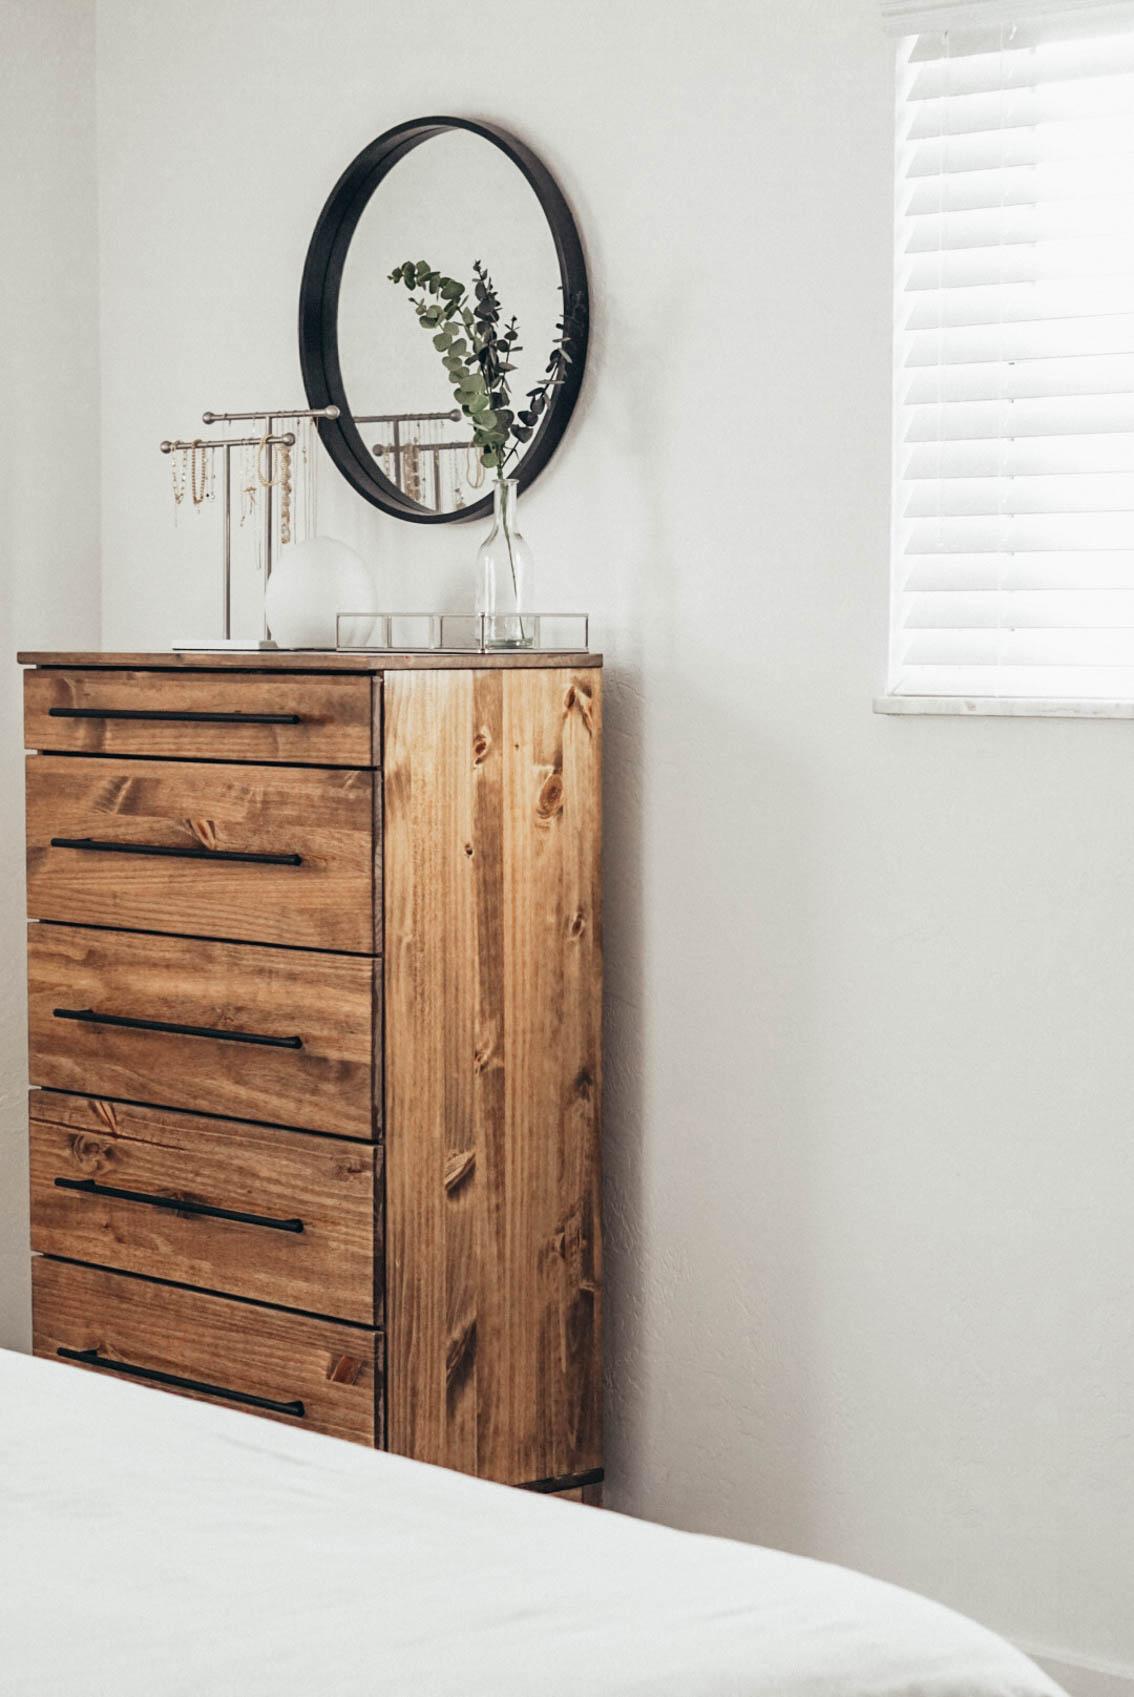 Diy Ikea Dresser Staining Tutorial